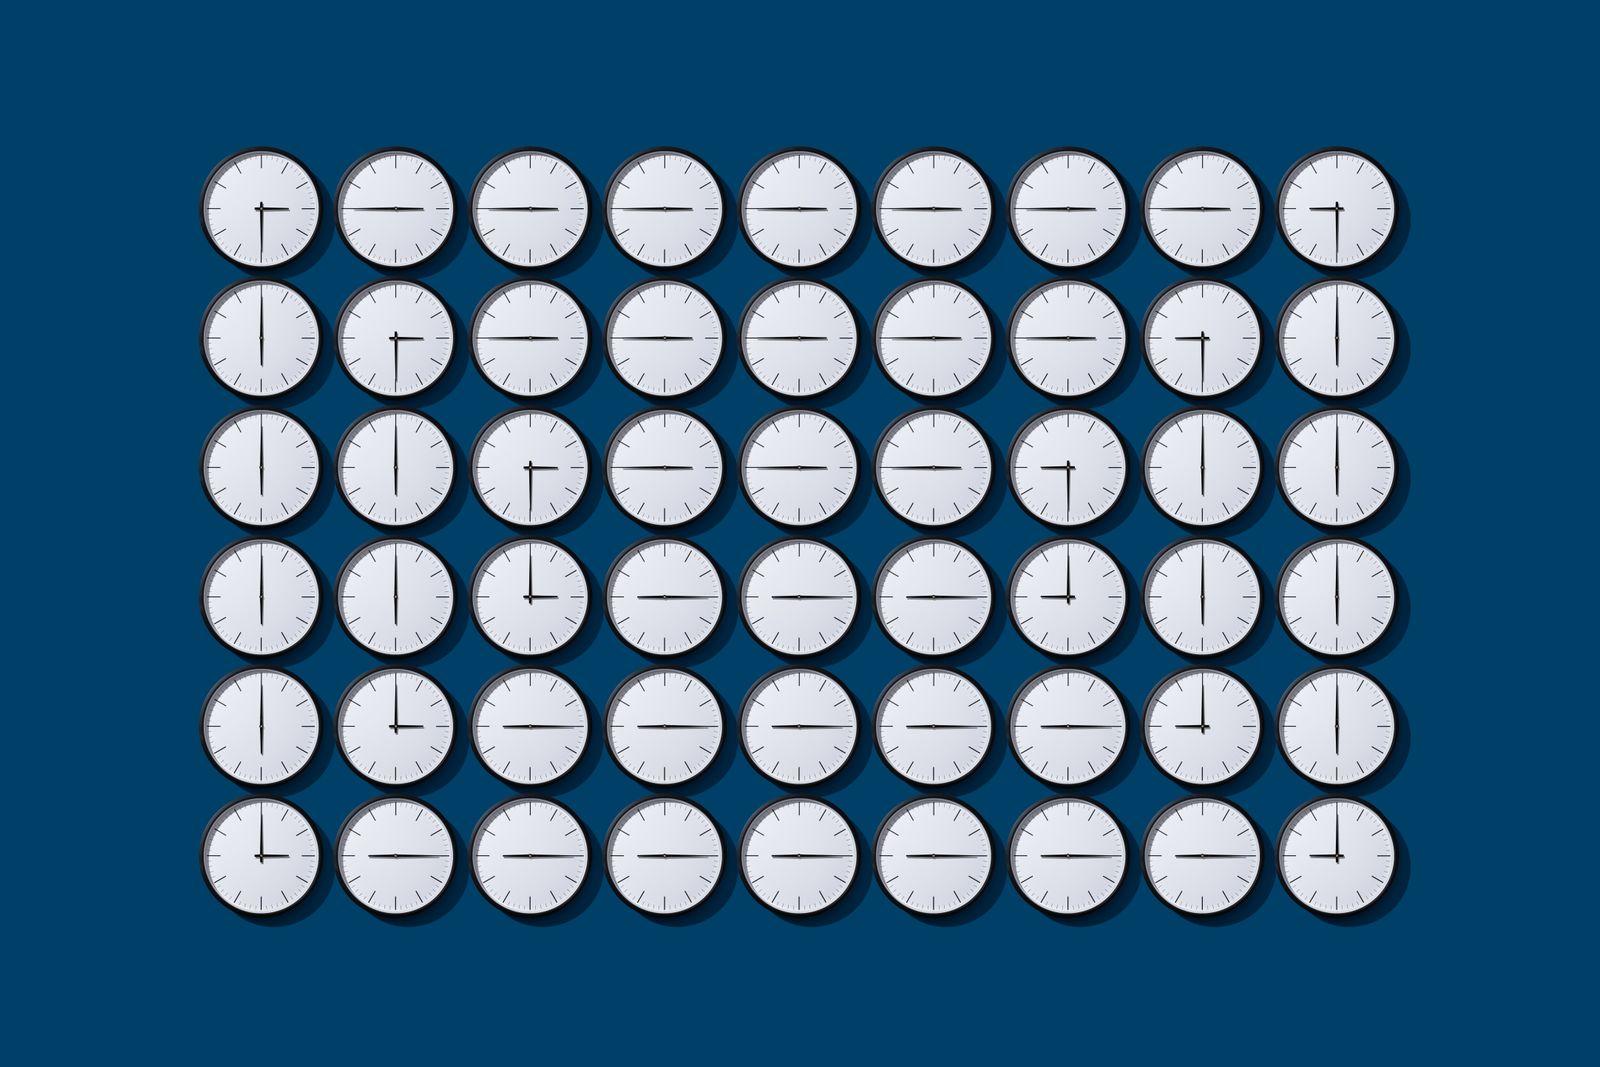 Arranged Clock Hands Loops